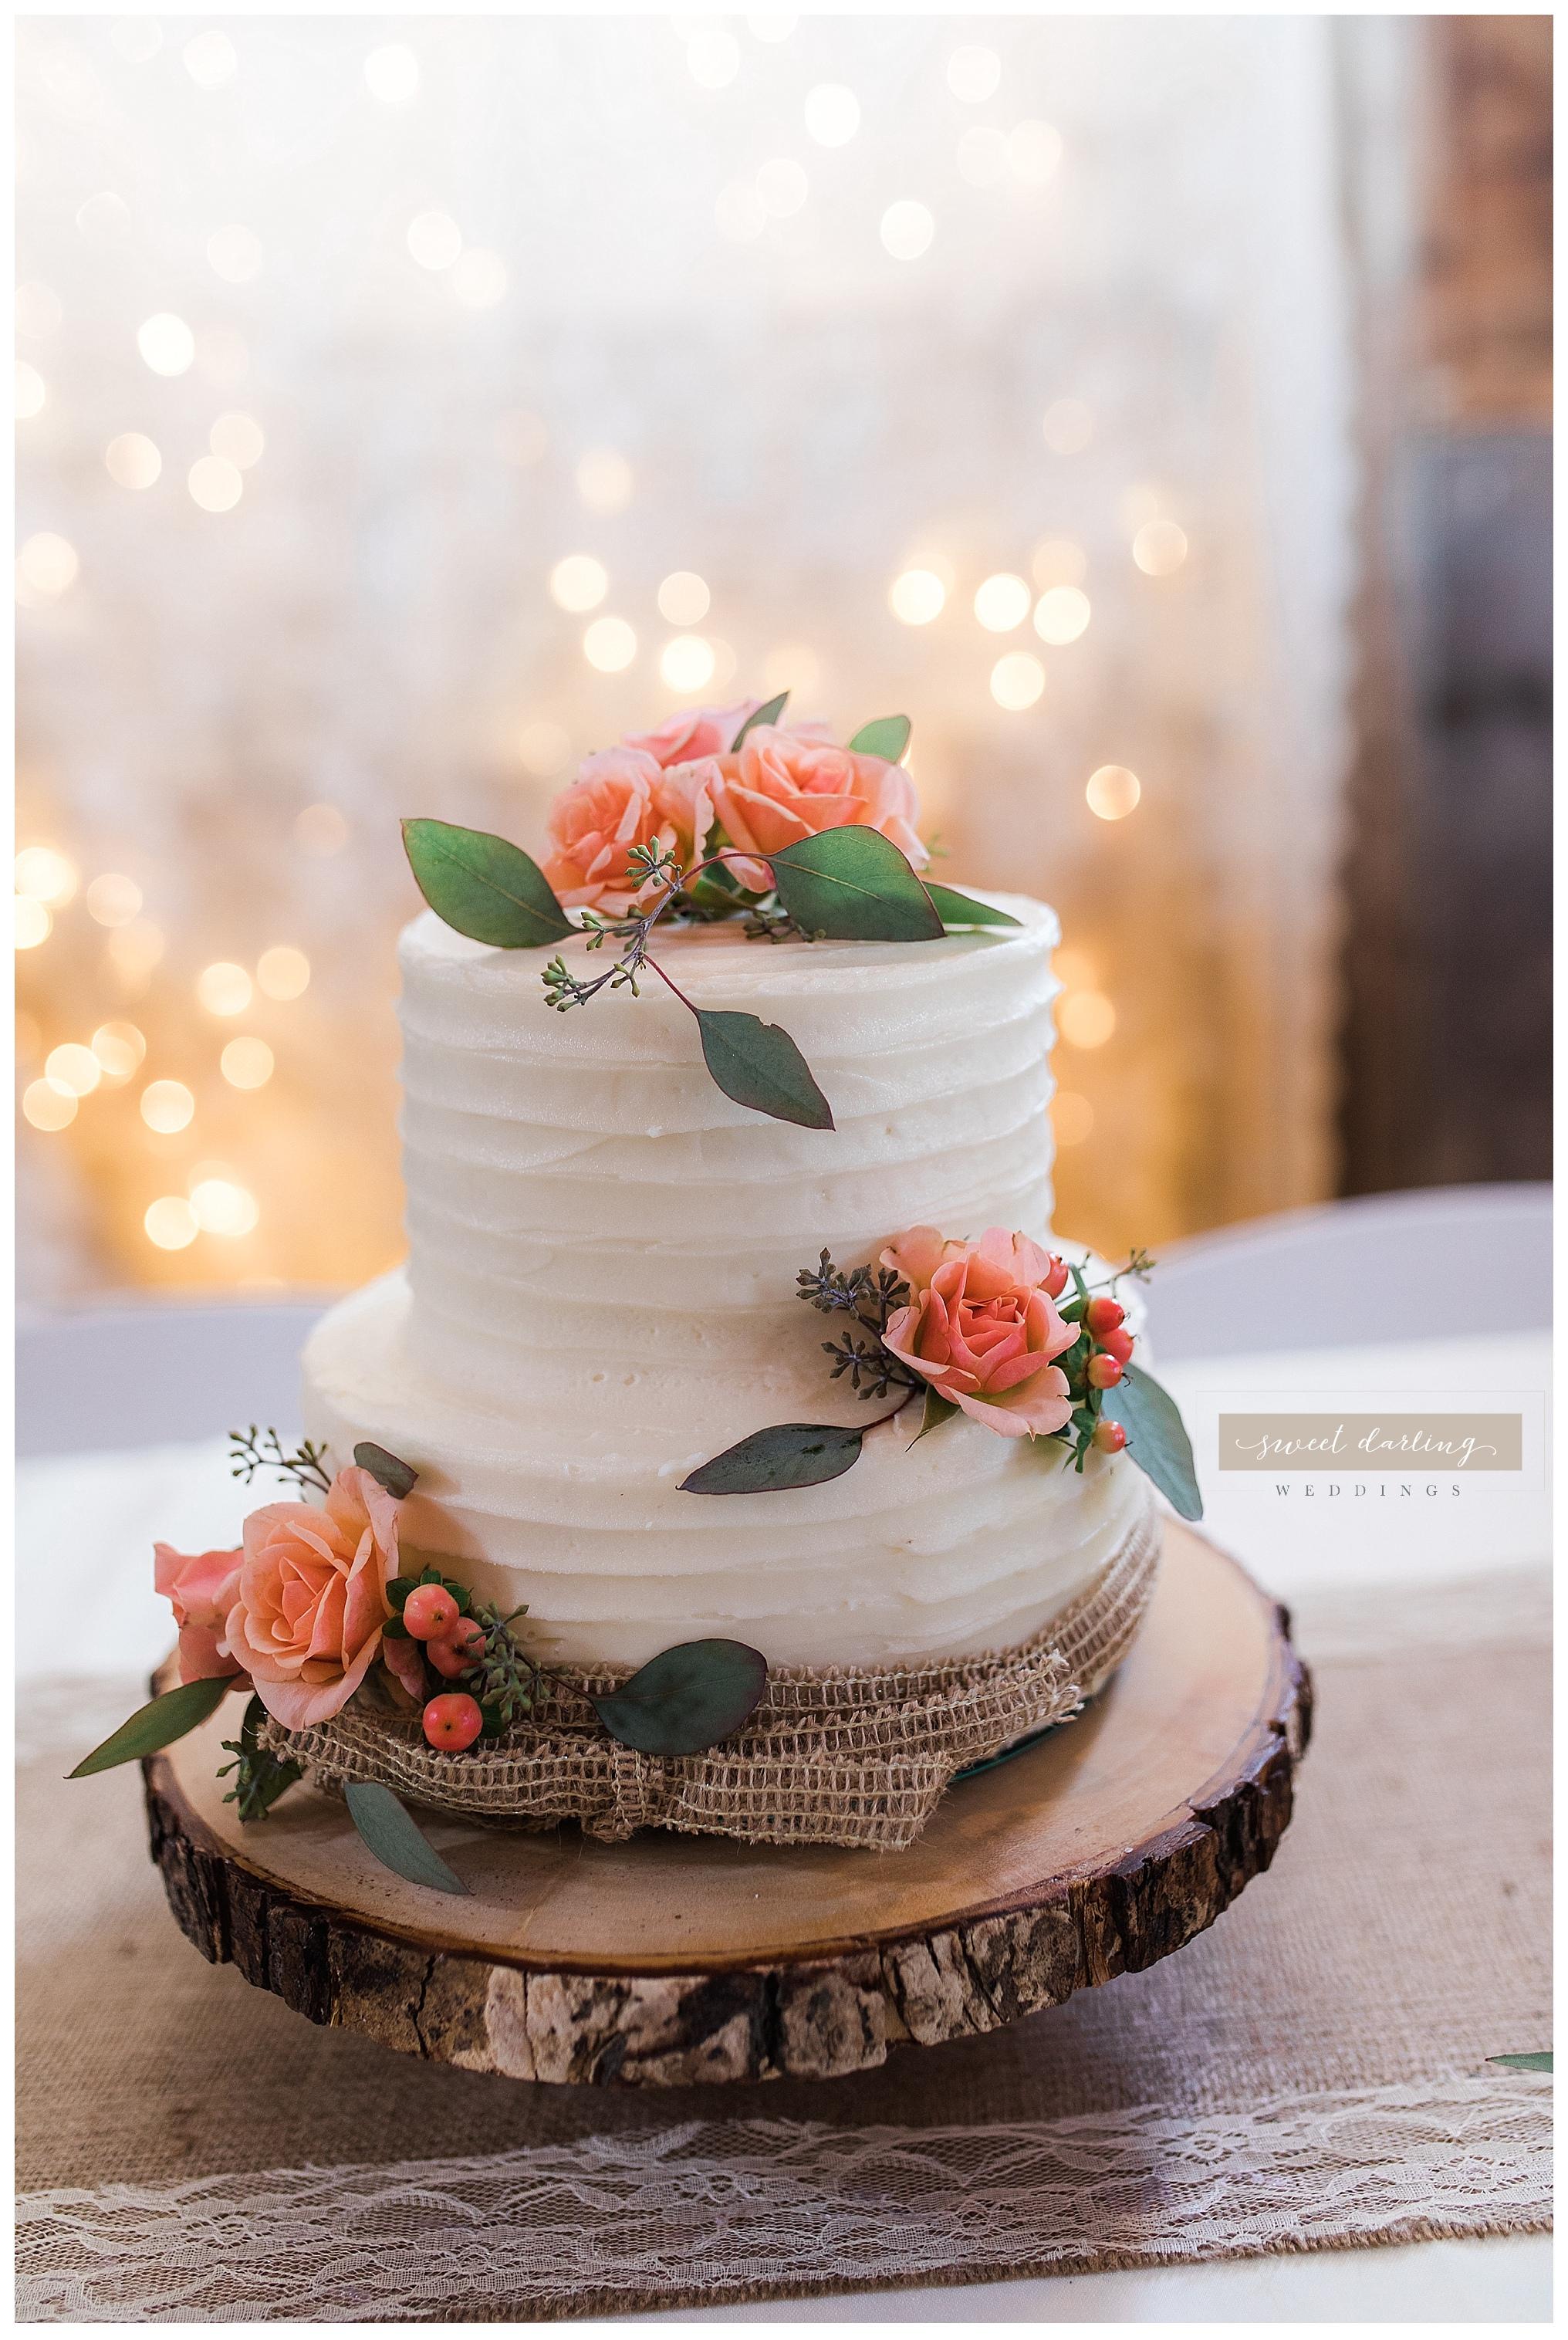 Paxton-illinois-engelbrecht-farmstead-romantic-wedding-photographer-sweet-darling-weddings_1217.jpg